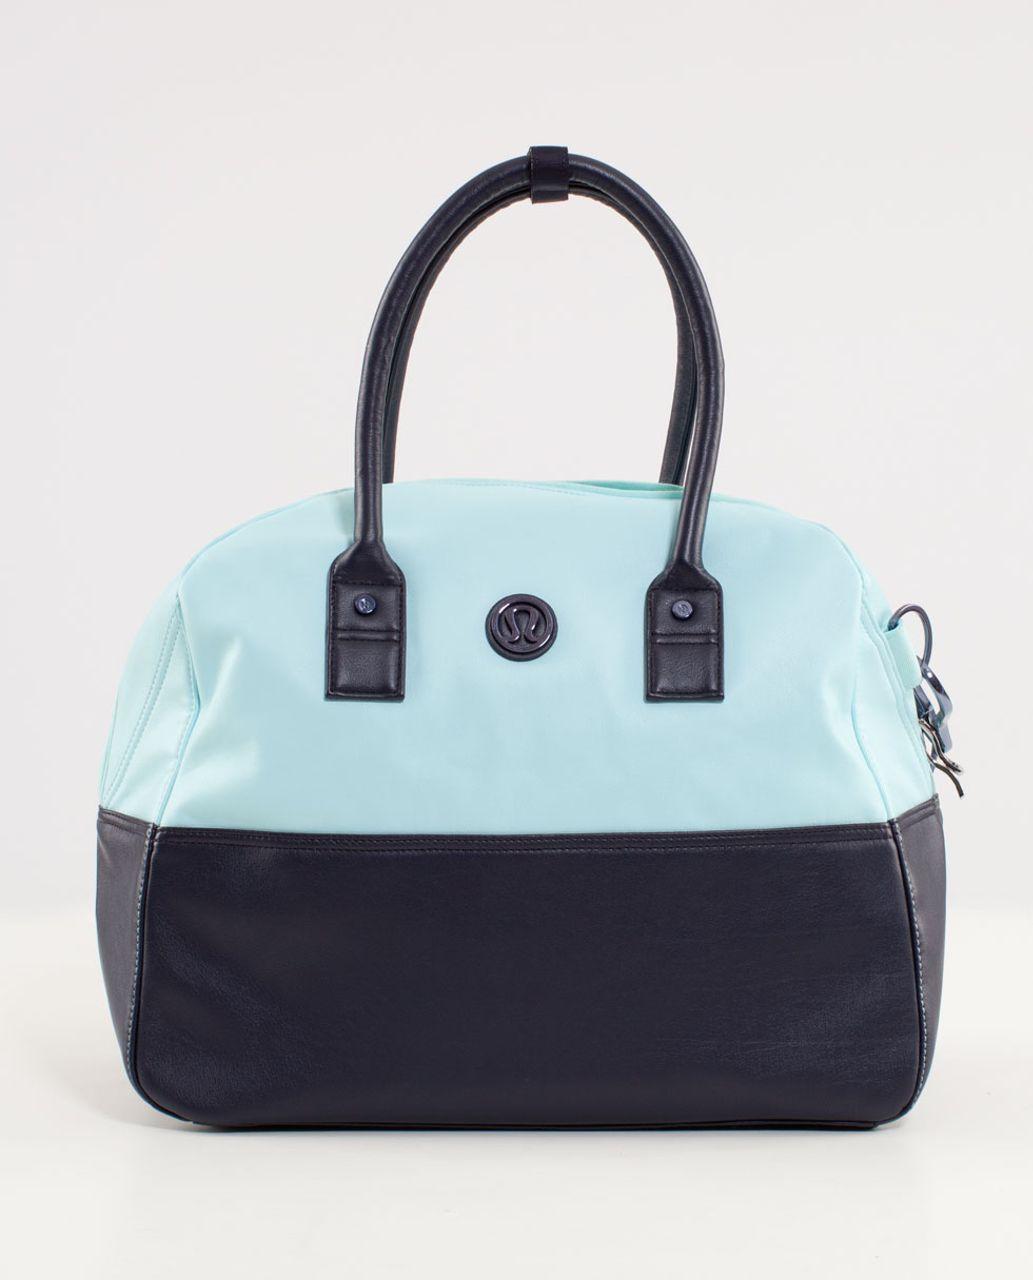 Lululemon Daily Gym Bag Aquamarine Deep Indigo